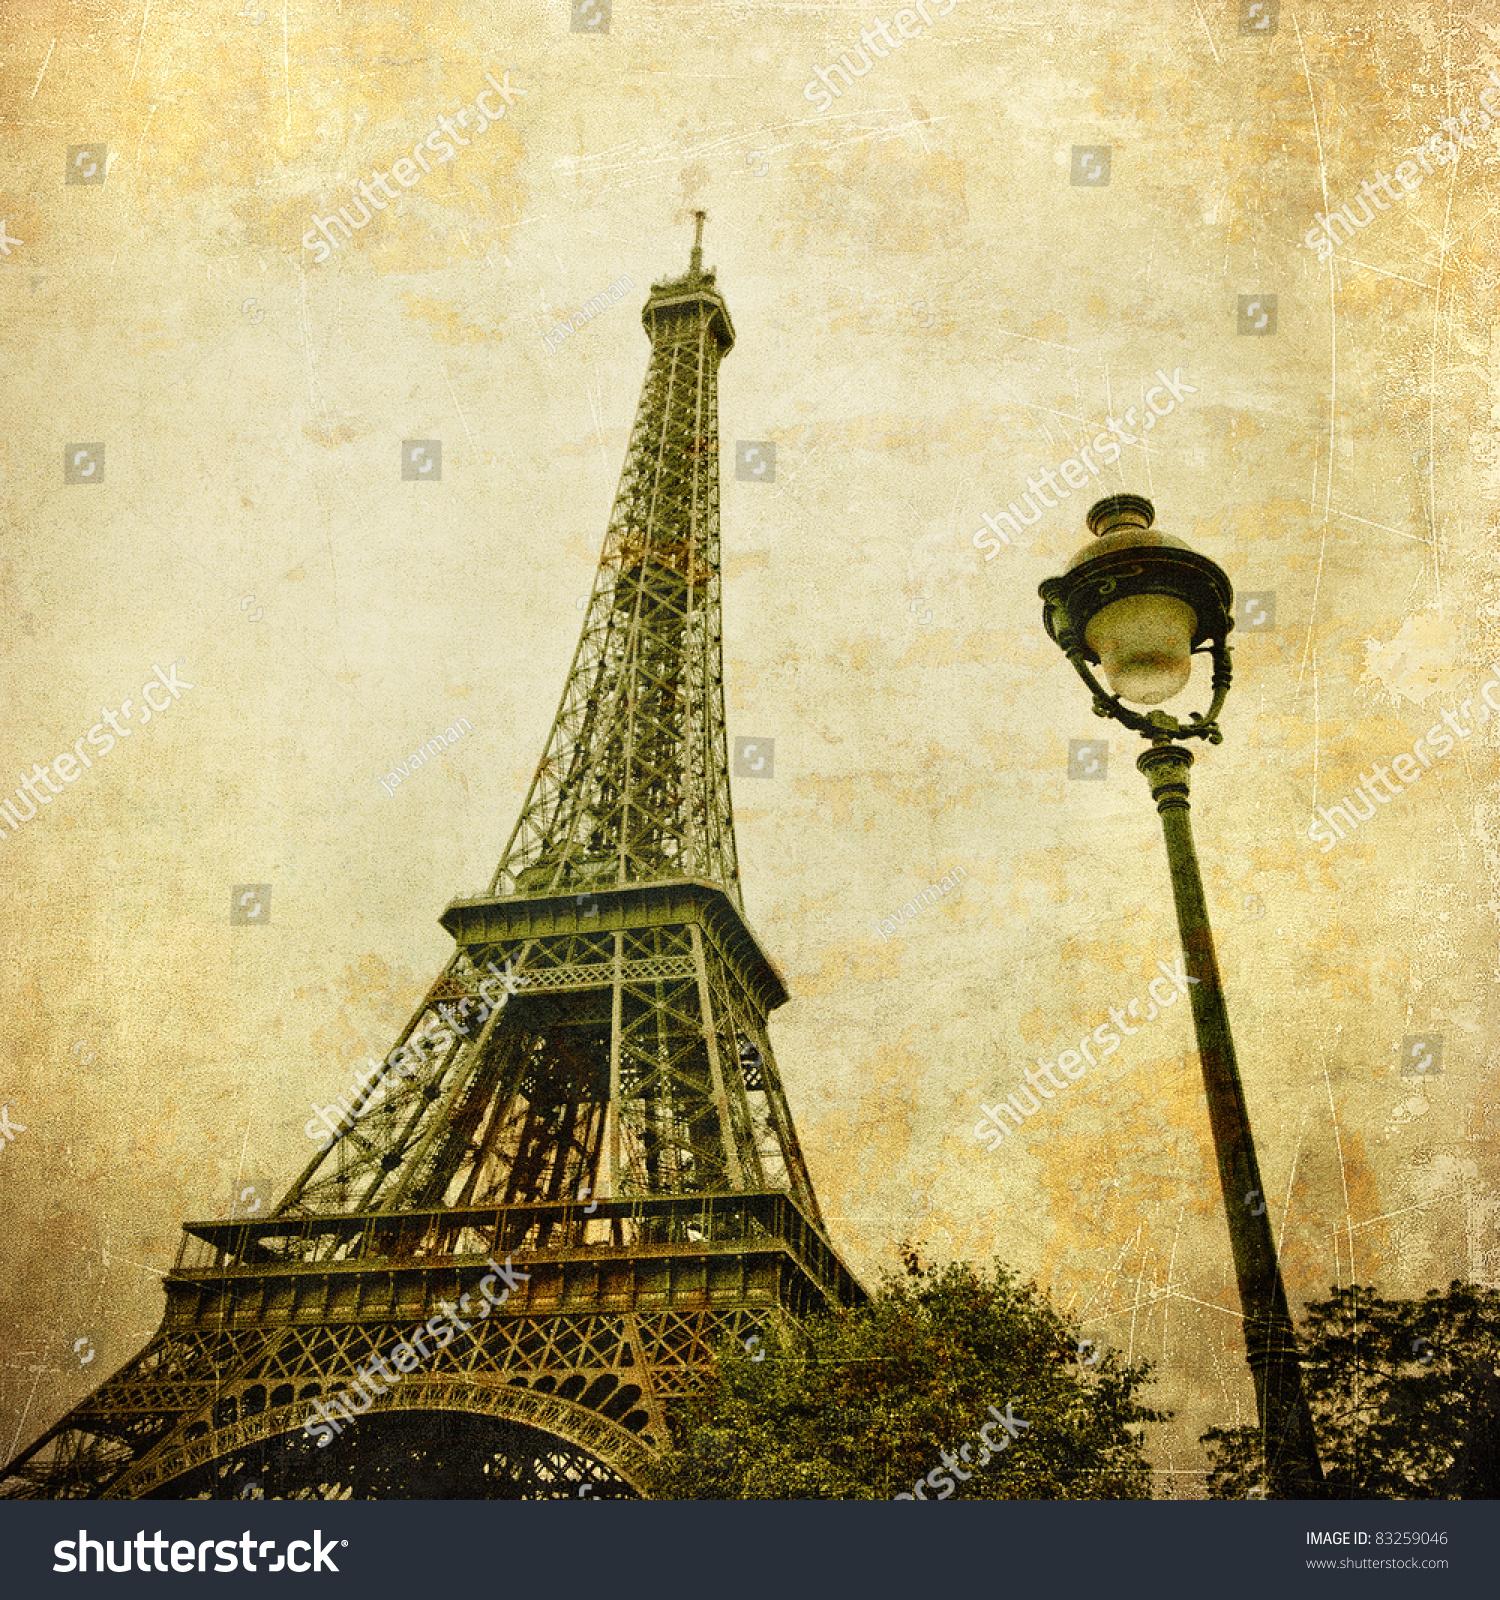 3eb345c8f7e9 Vintage Image Eiffel Tower Paris France – stock ilustrace 83259046 ...